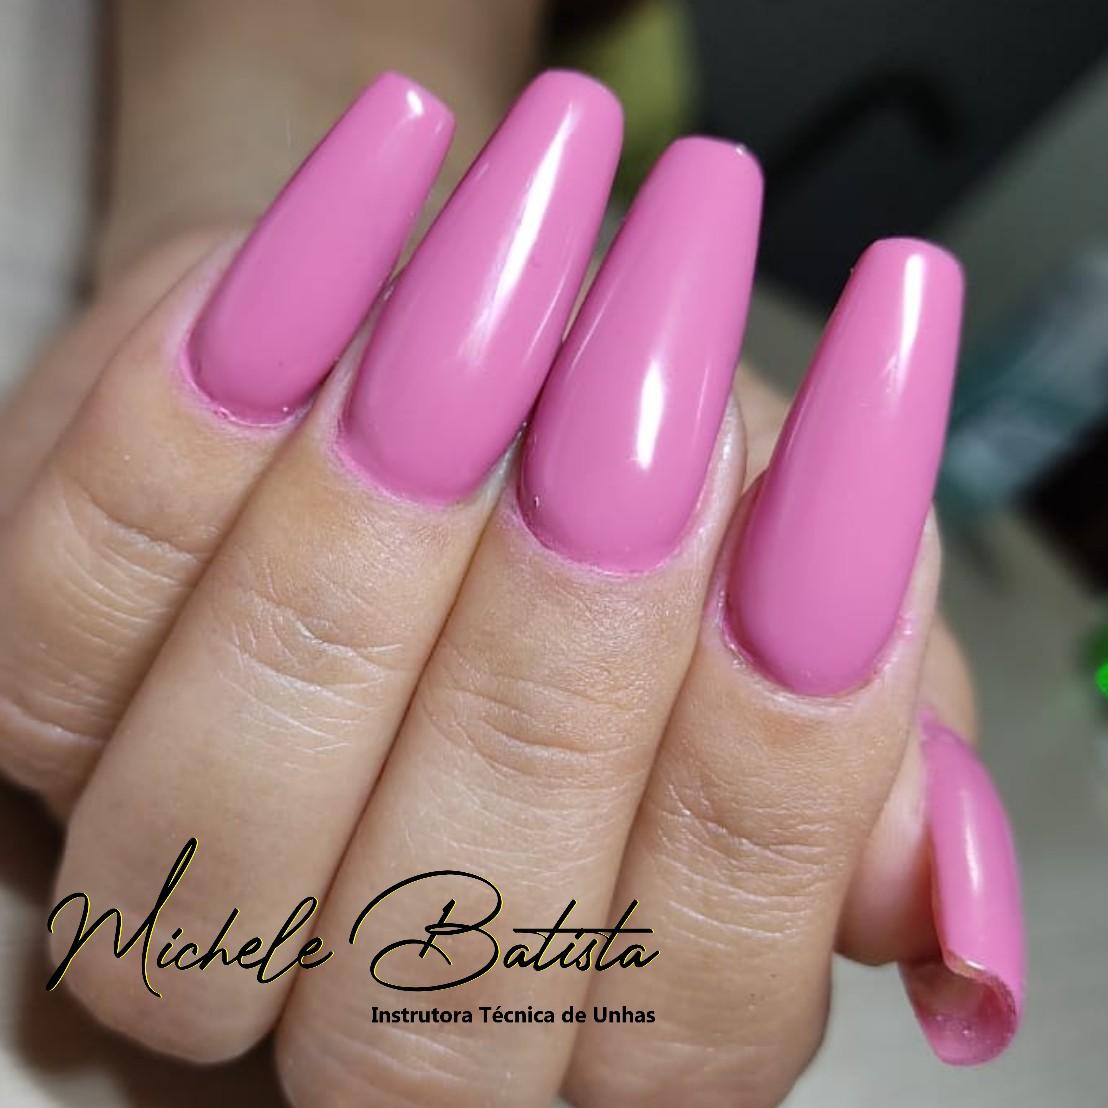 Michele Batista Instrutora Técnica Nails